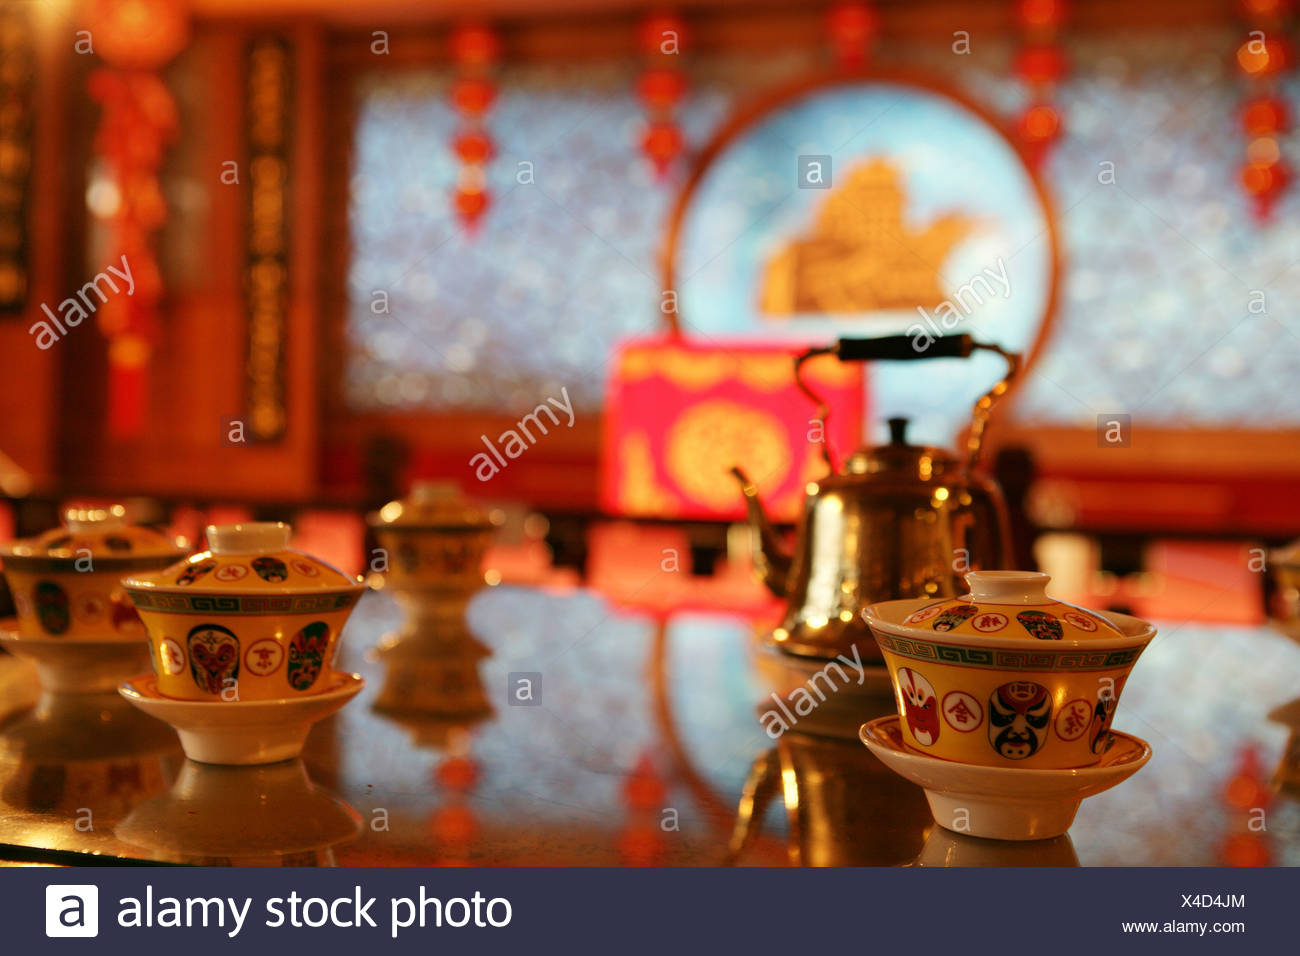 Caff,Tea Set - Stock Image